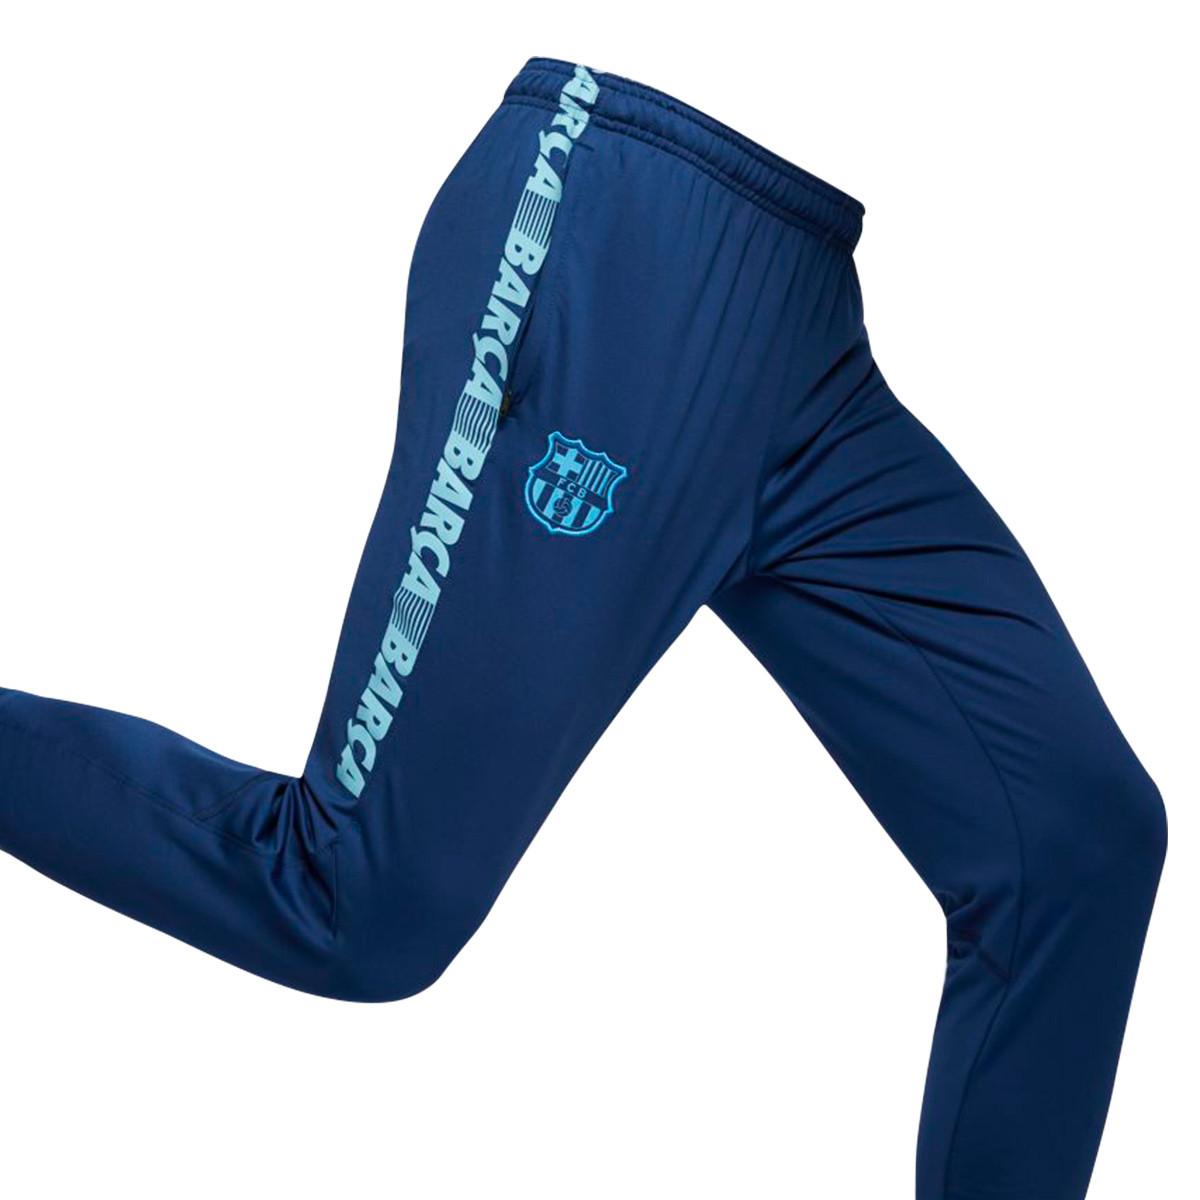 ضائقة خط يد إنسان Pantalon Barca Nike Nemoshideaway Com